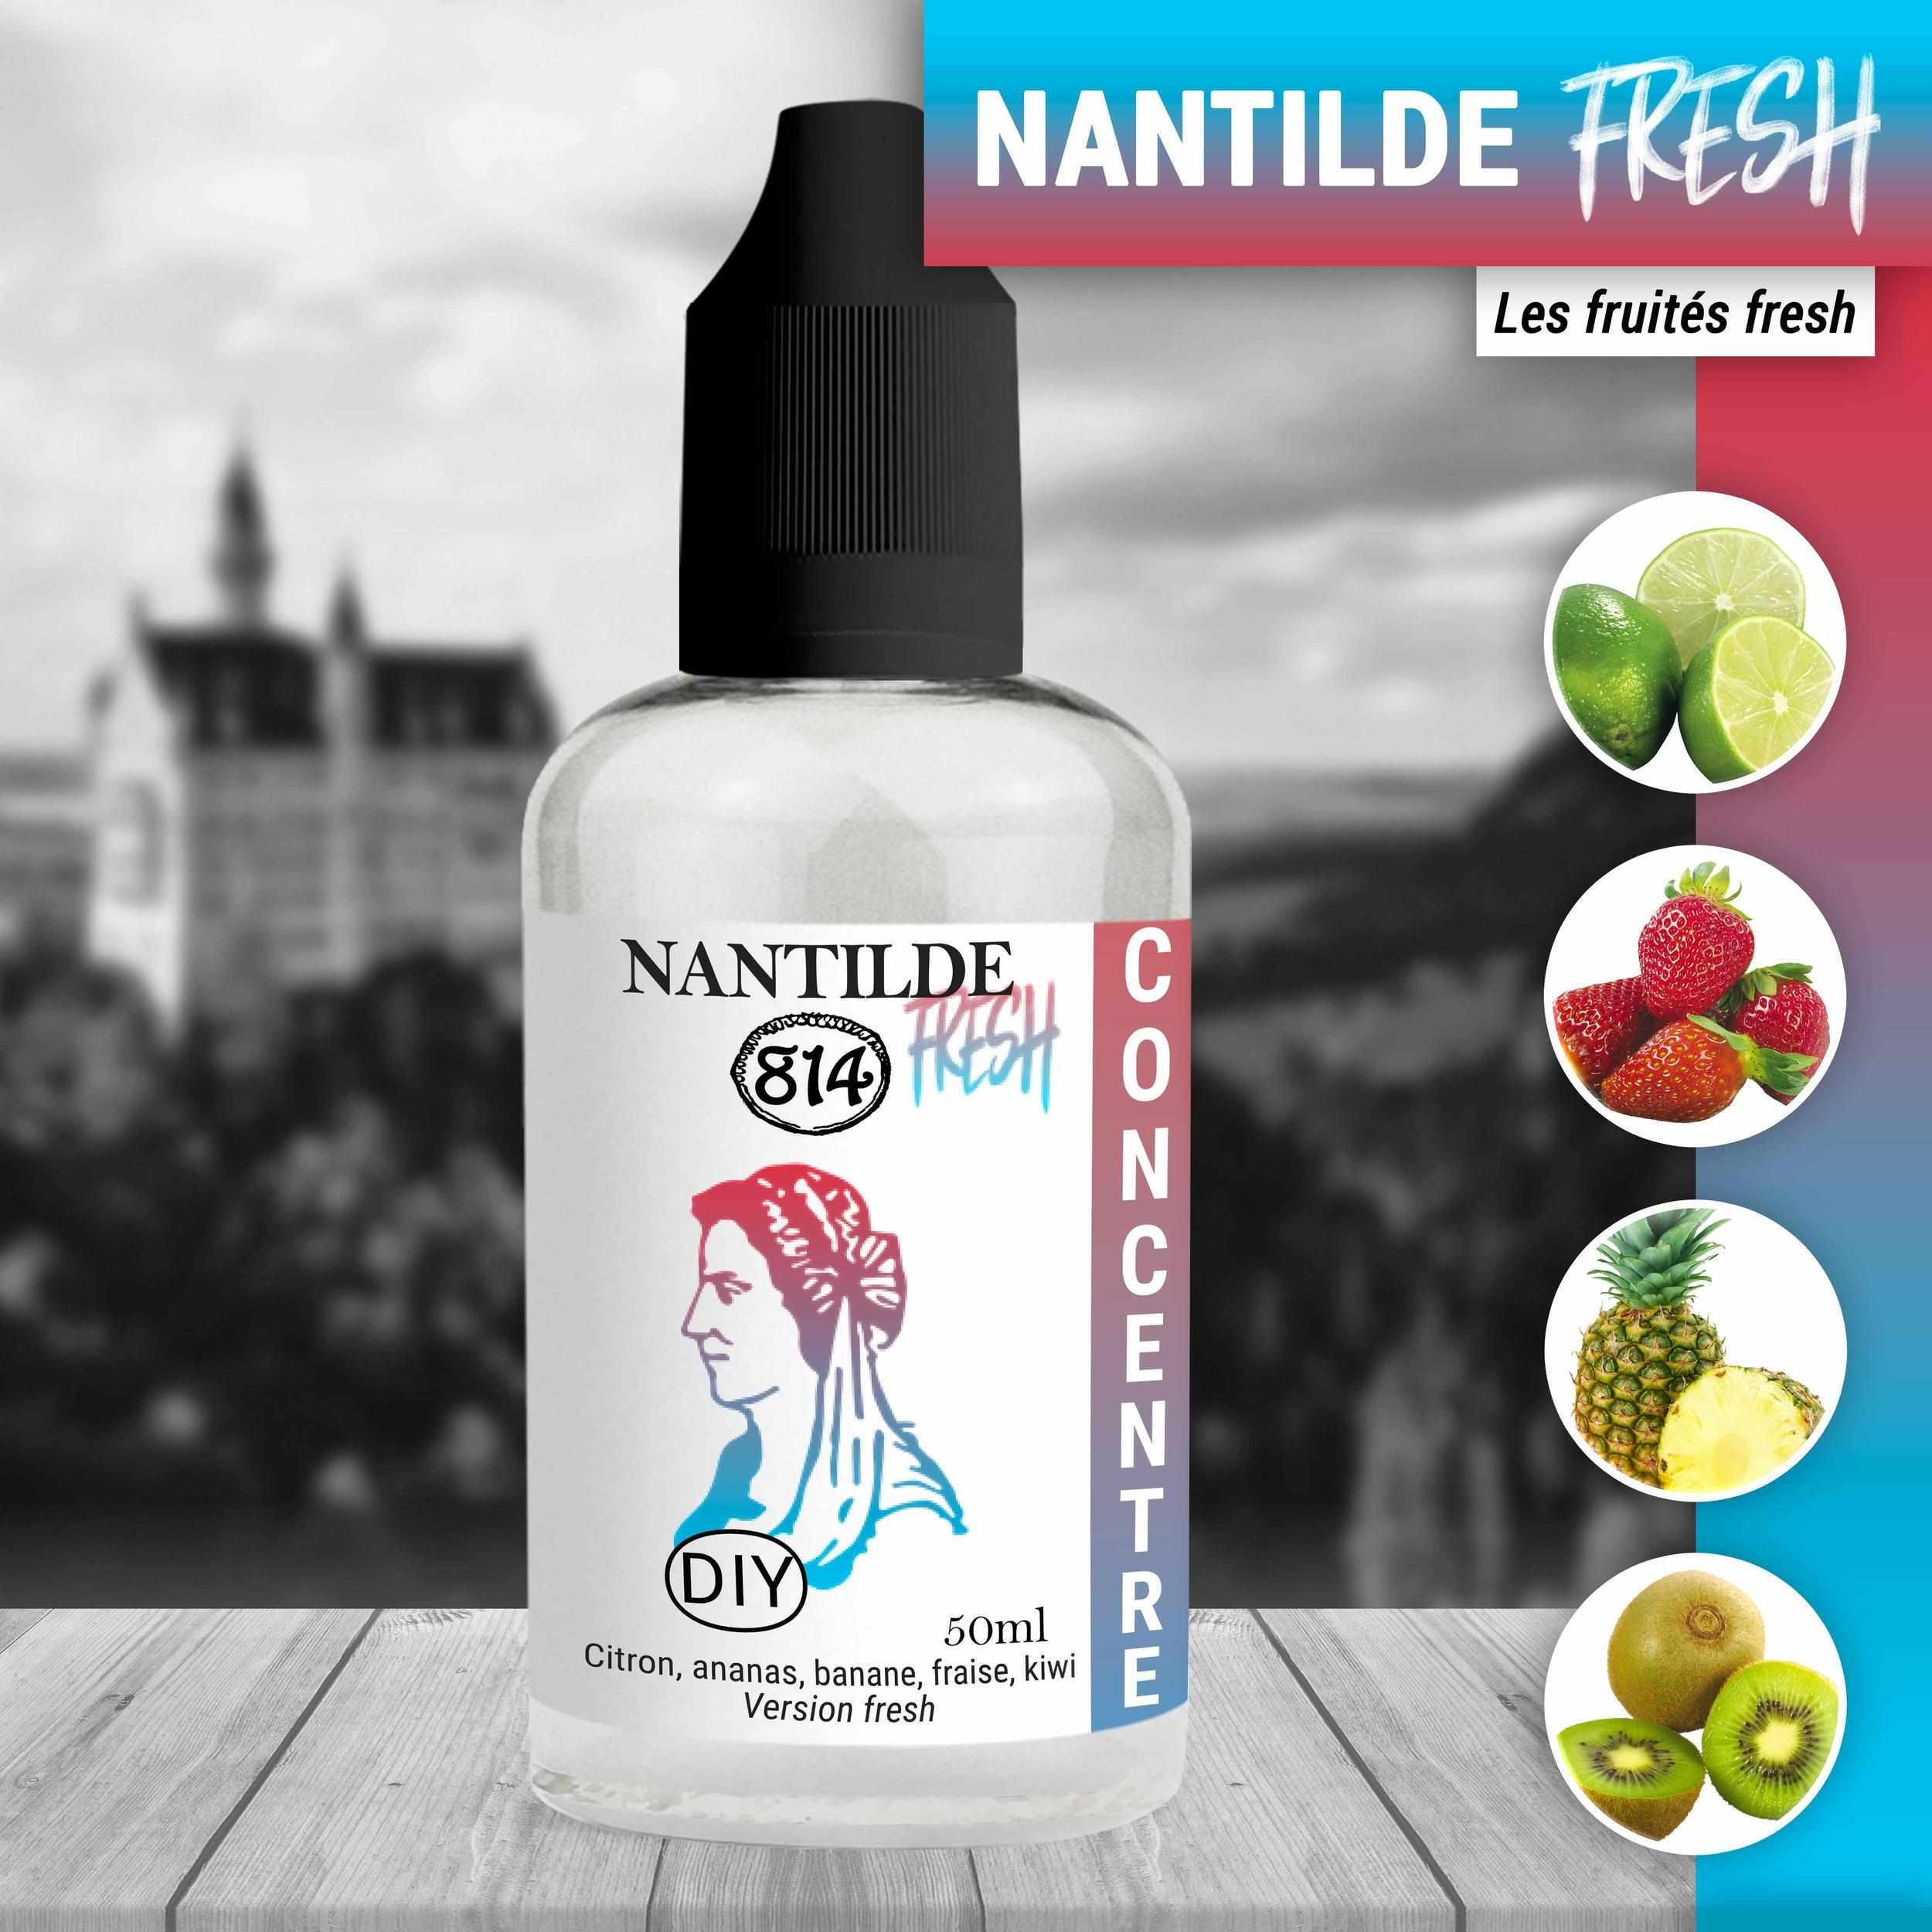 Concentré Nantilde fresh 50ml